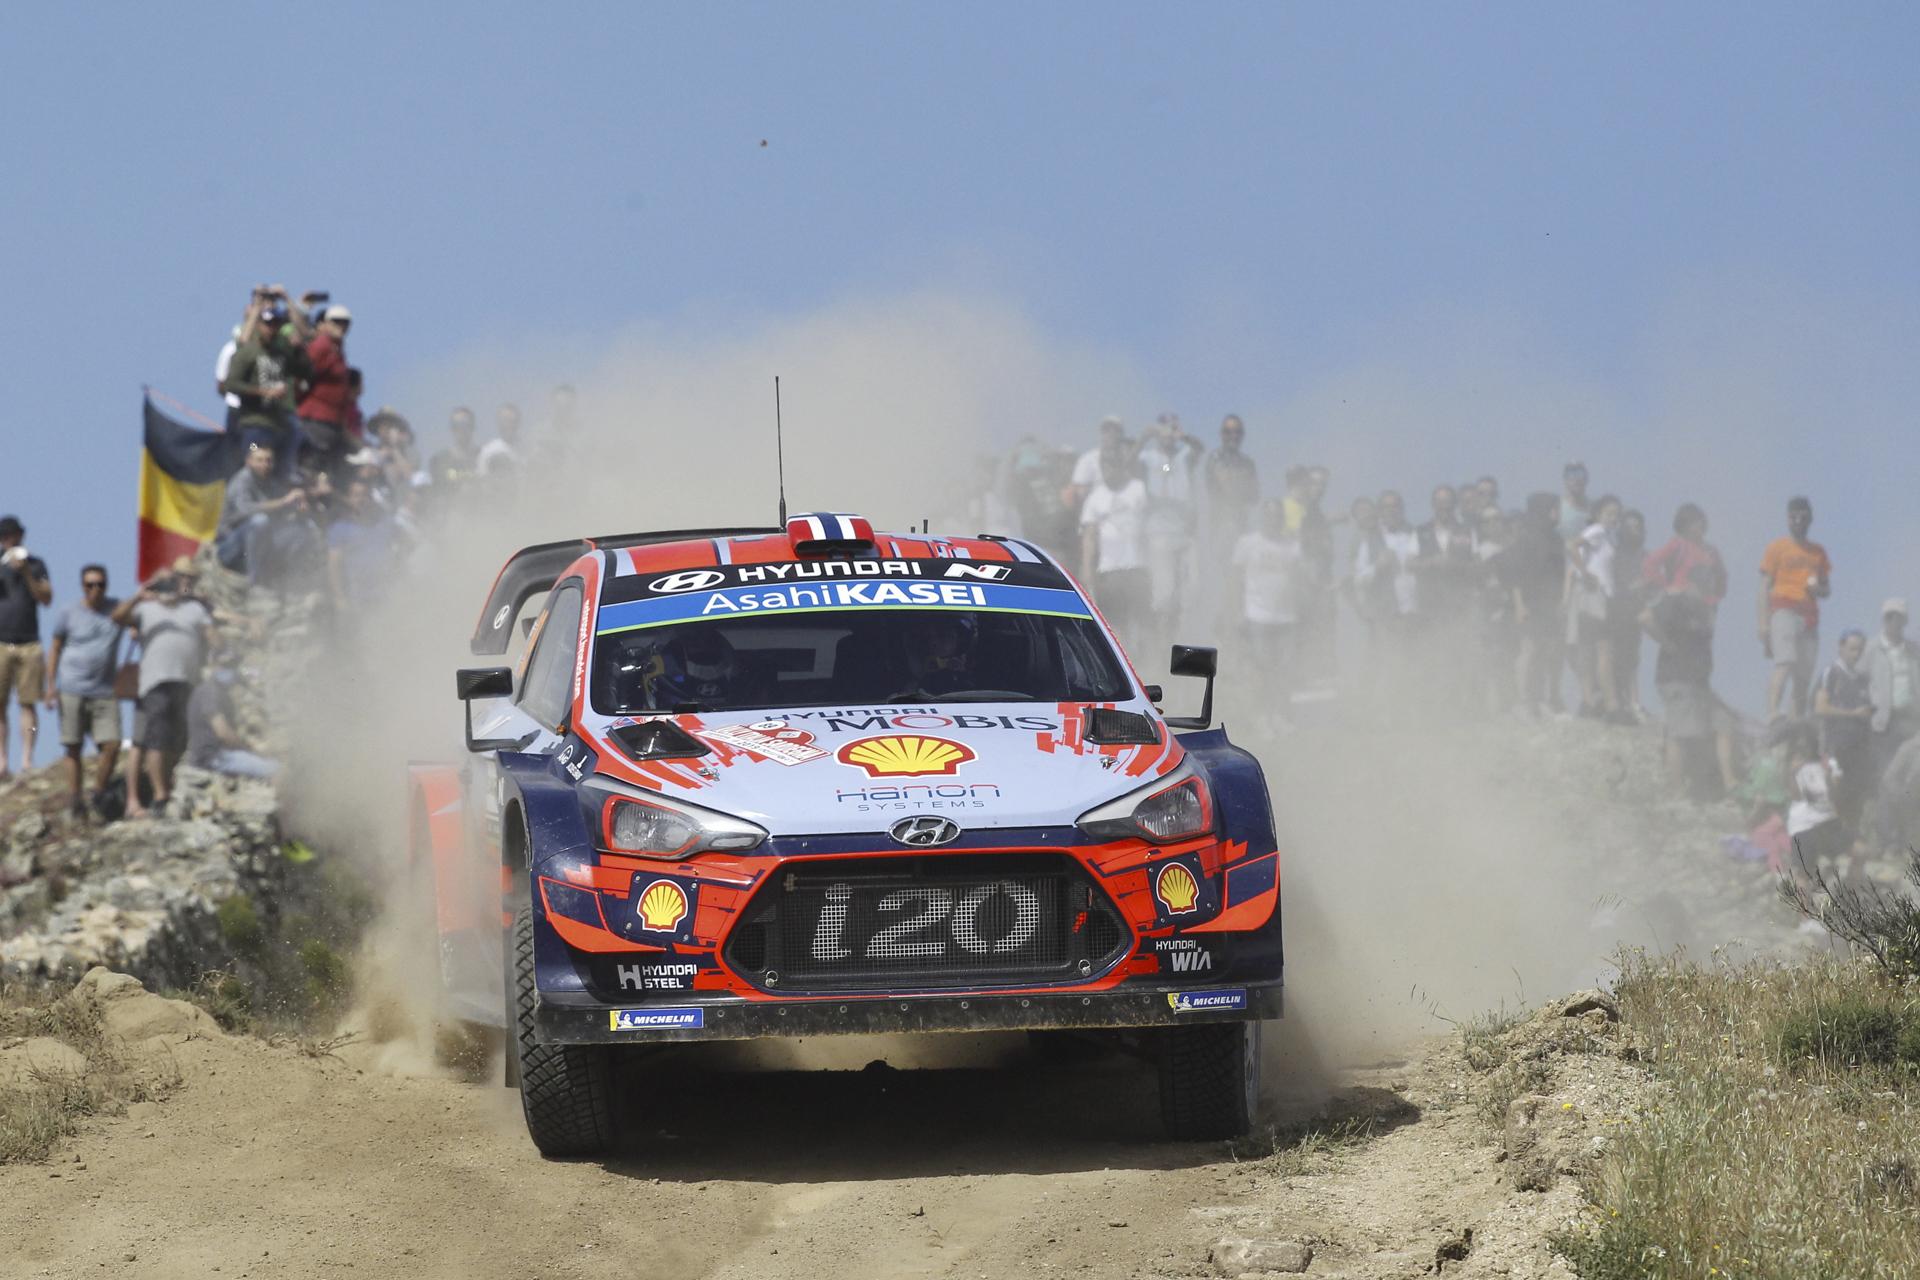 HyundaiMotorsport_RallyItaliaSardegna2019_Final_Mikkelsen_03